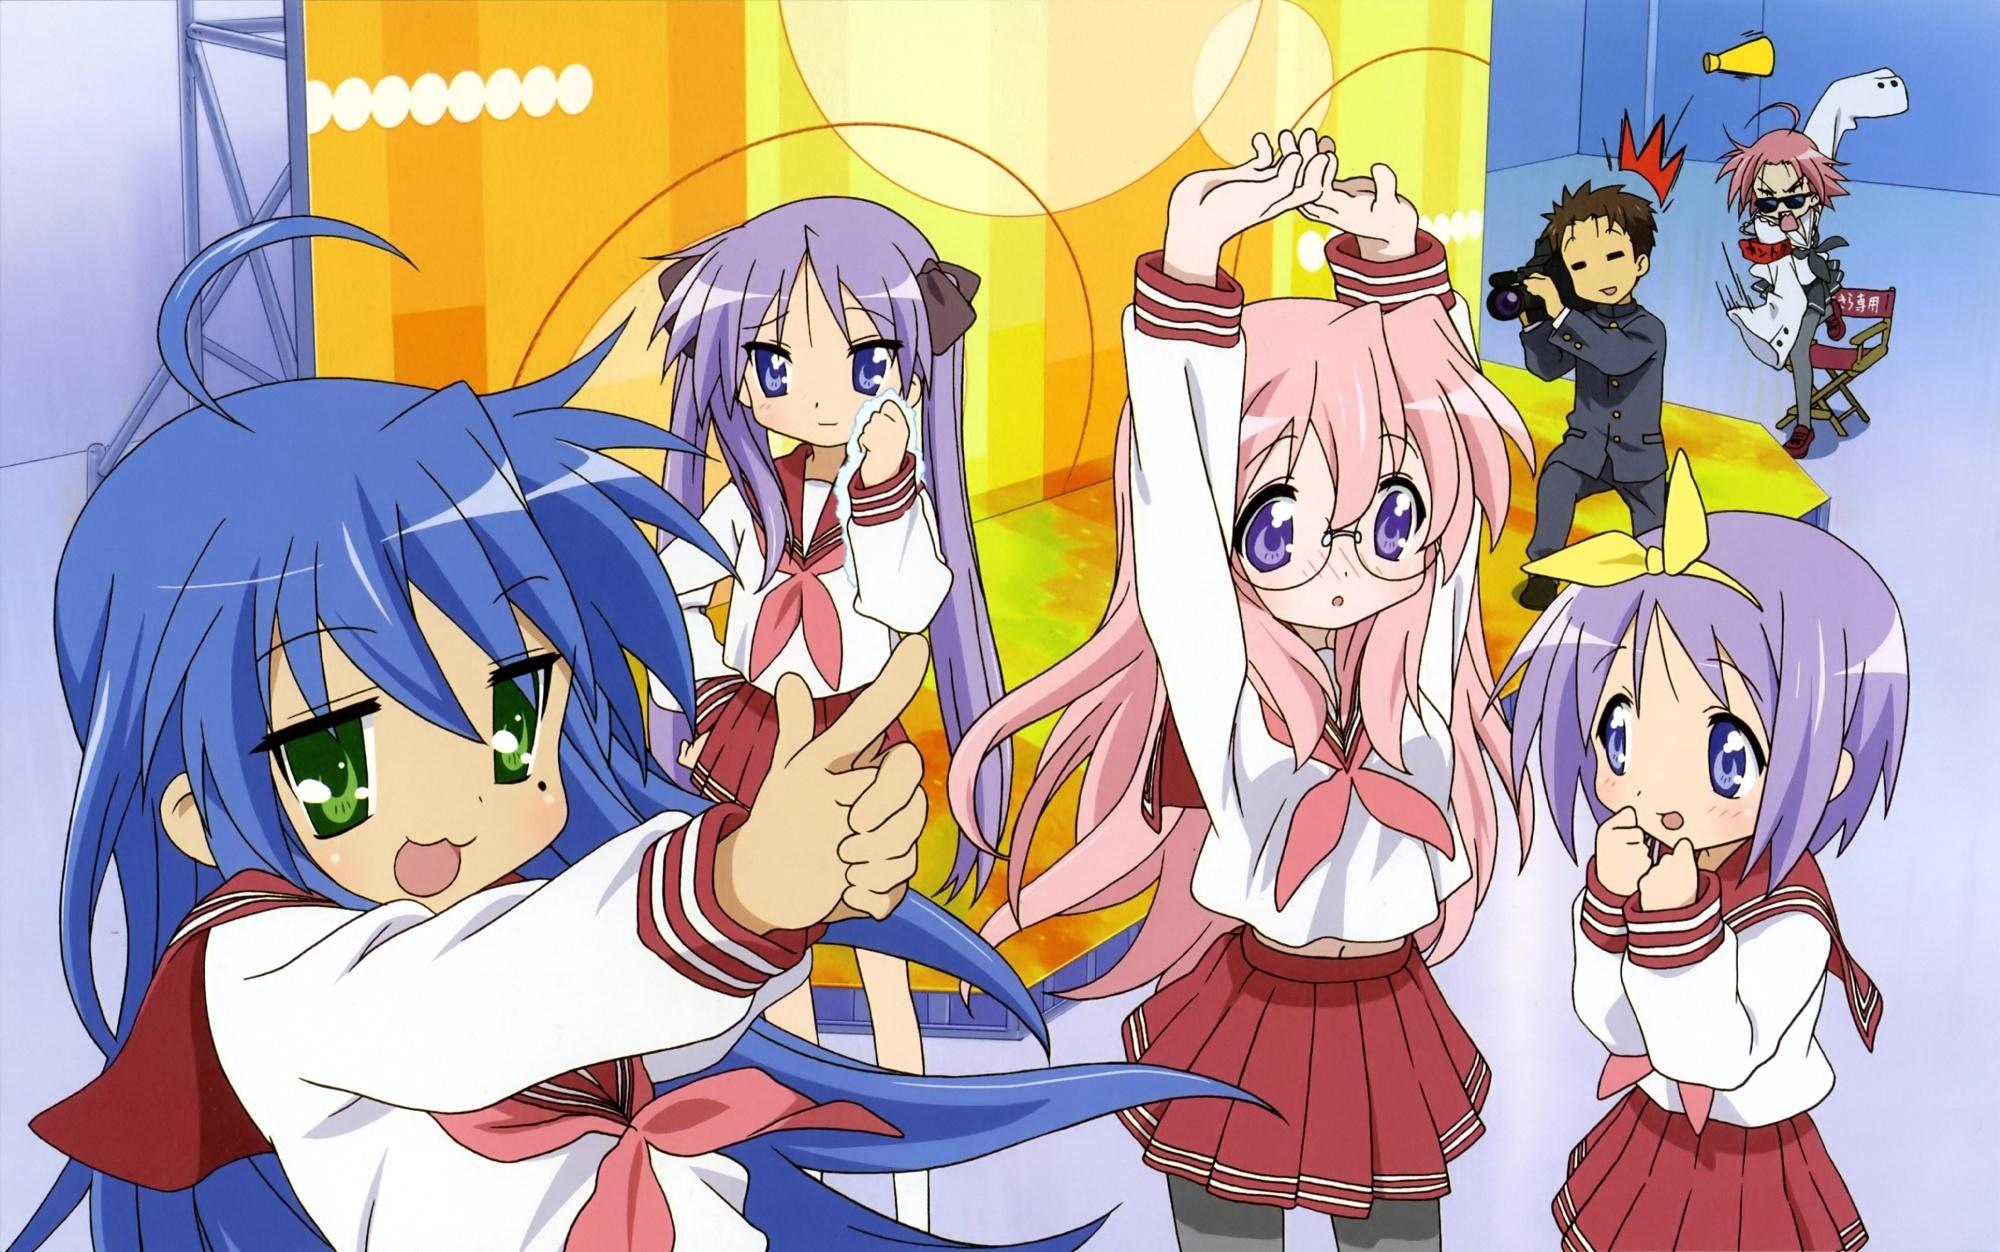 Behind The Scene of Motteke! Sailor Fuku